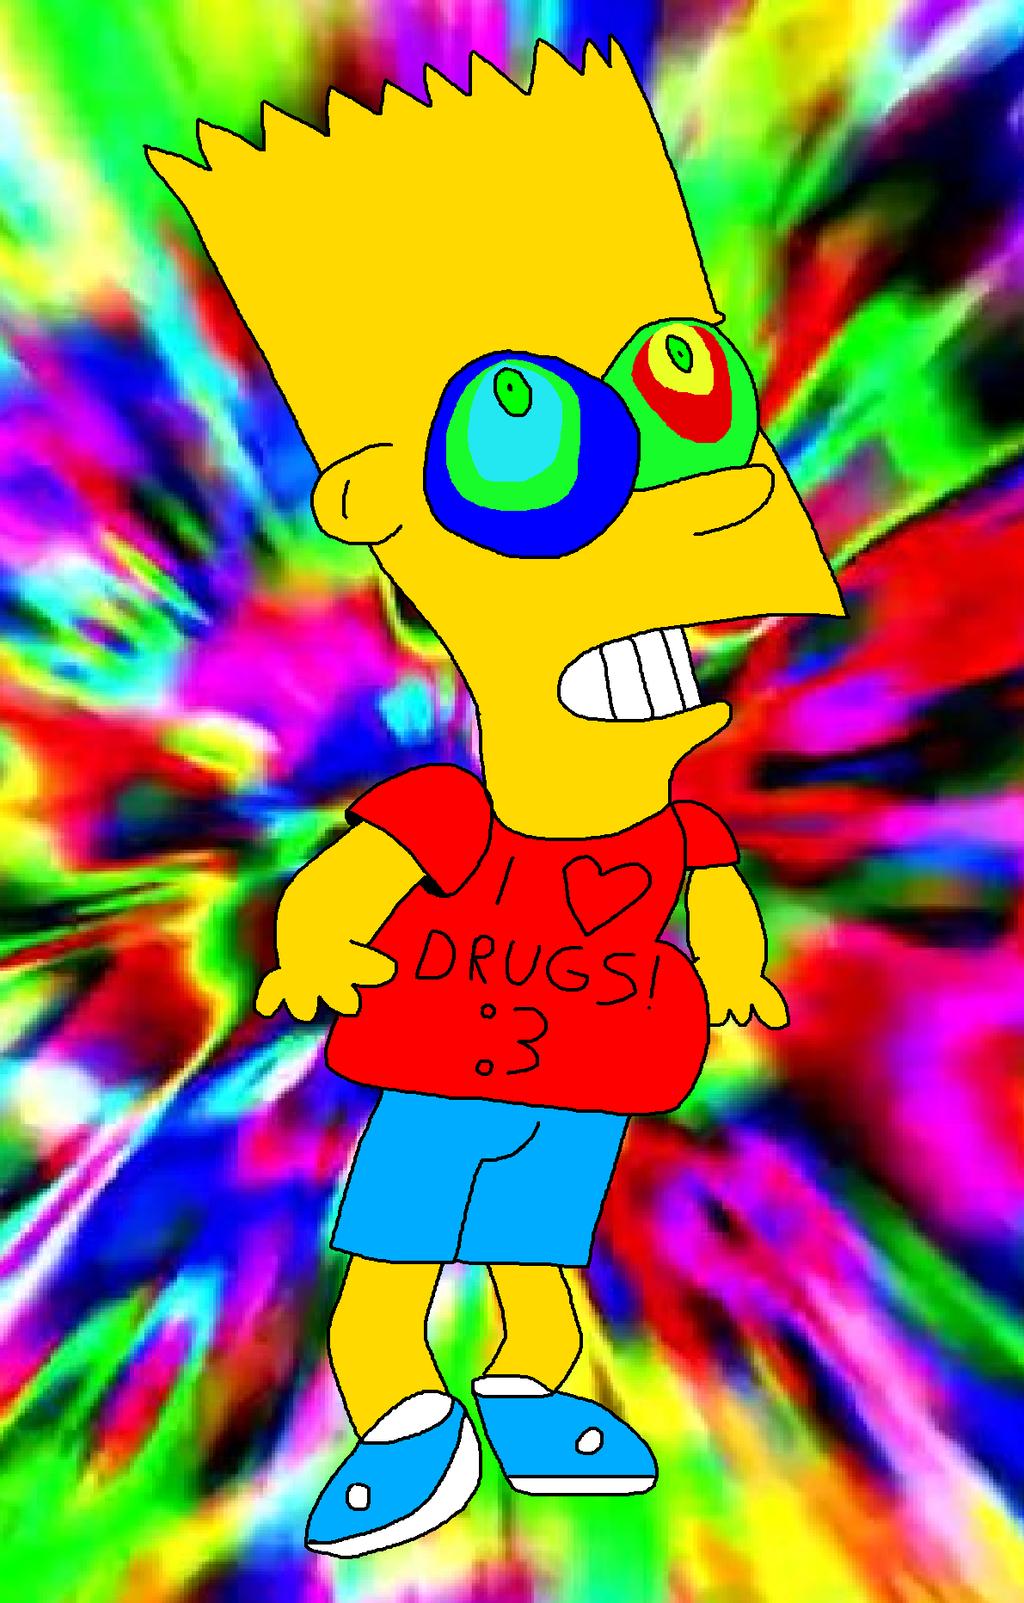 Bart Simpson on Acid by BartSimpsonFan2015 on DeviantArt